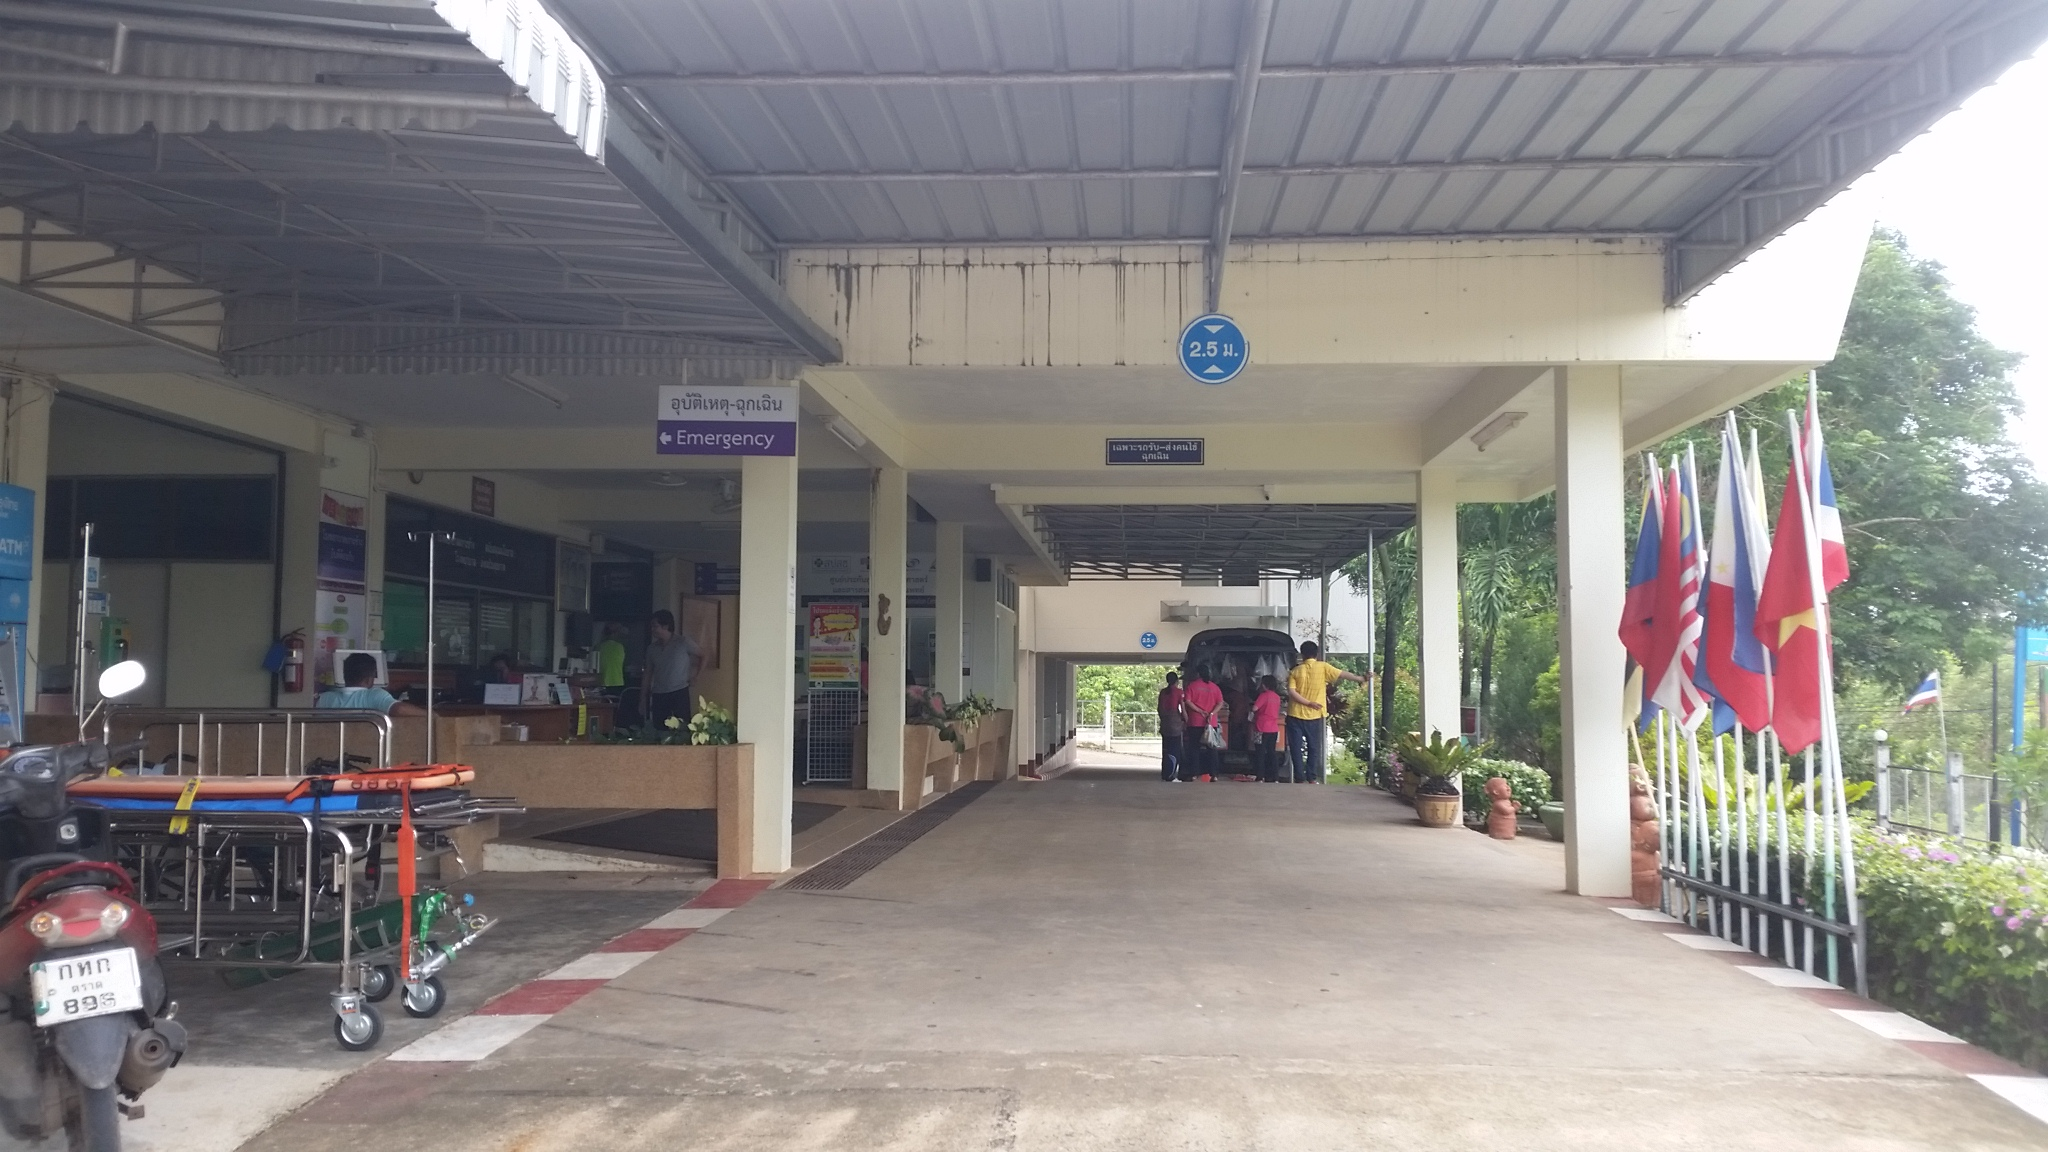 koh chang hospital front